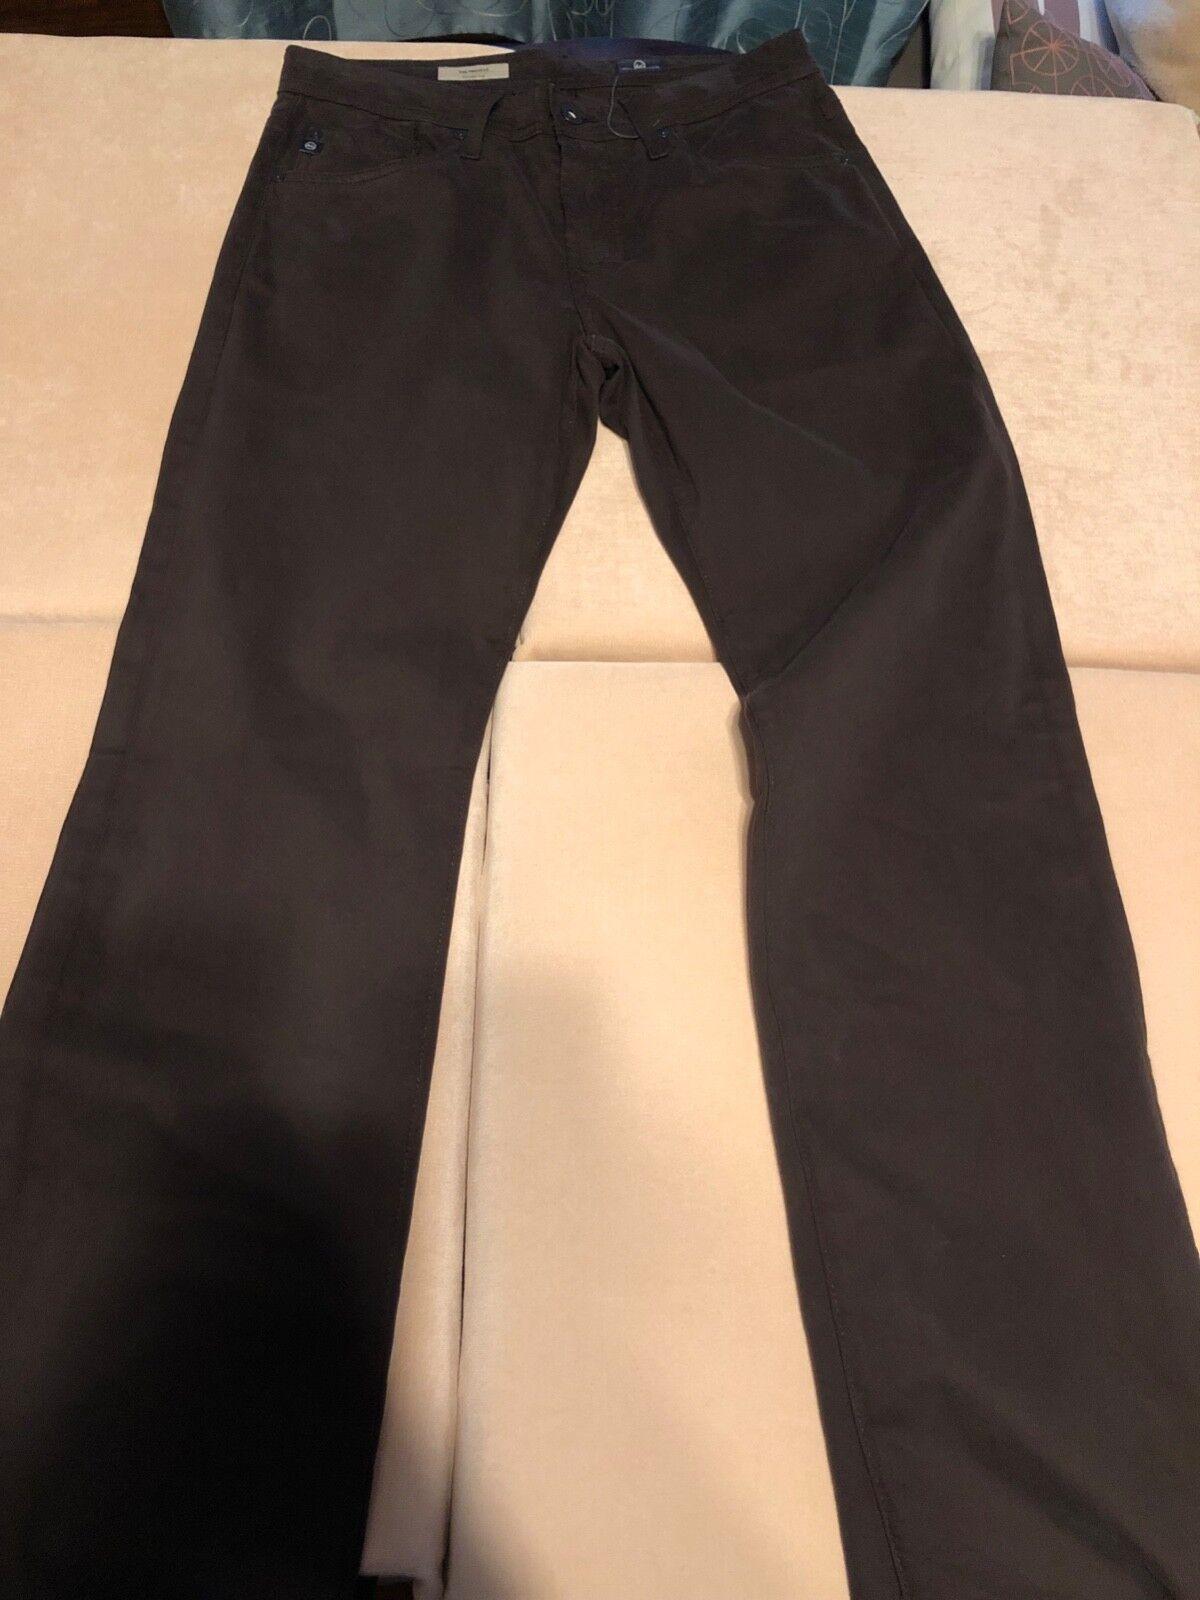 Men's AGADRIANO goldSCHMIED The Predege Jeans straight leg Brown size 29x34